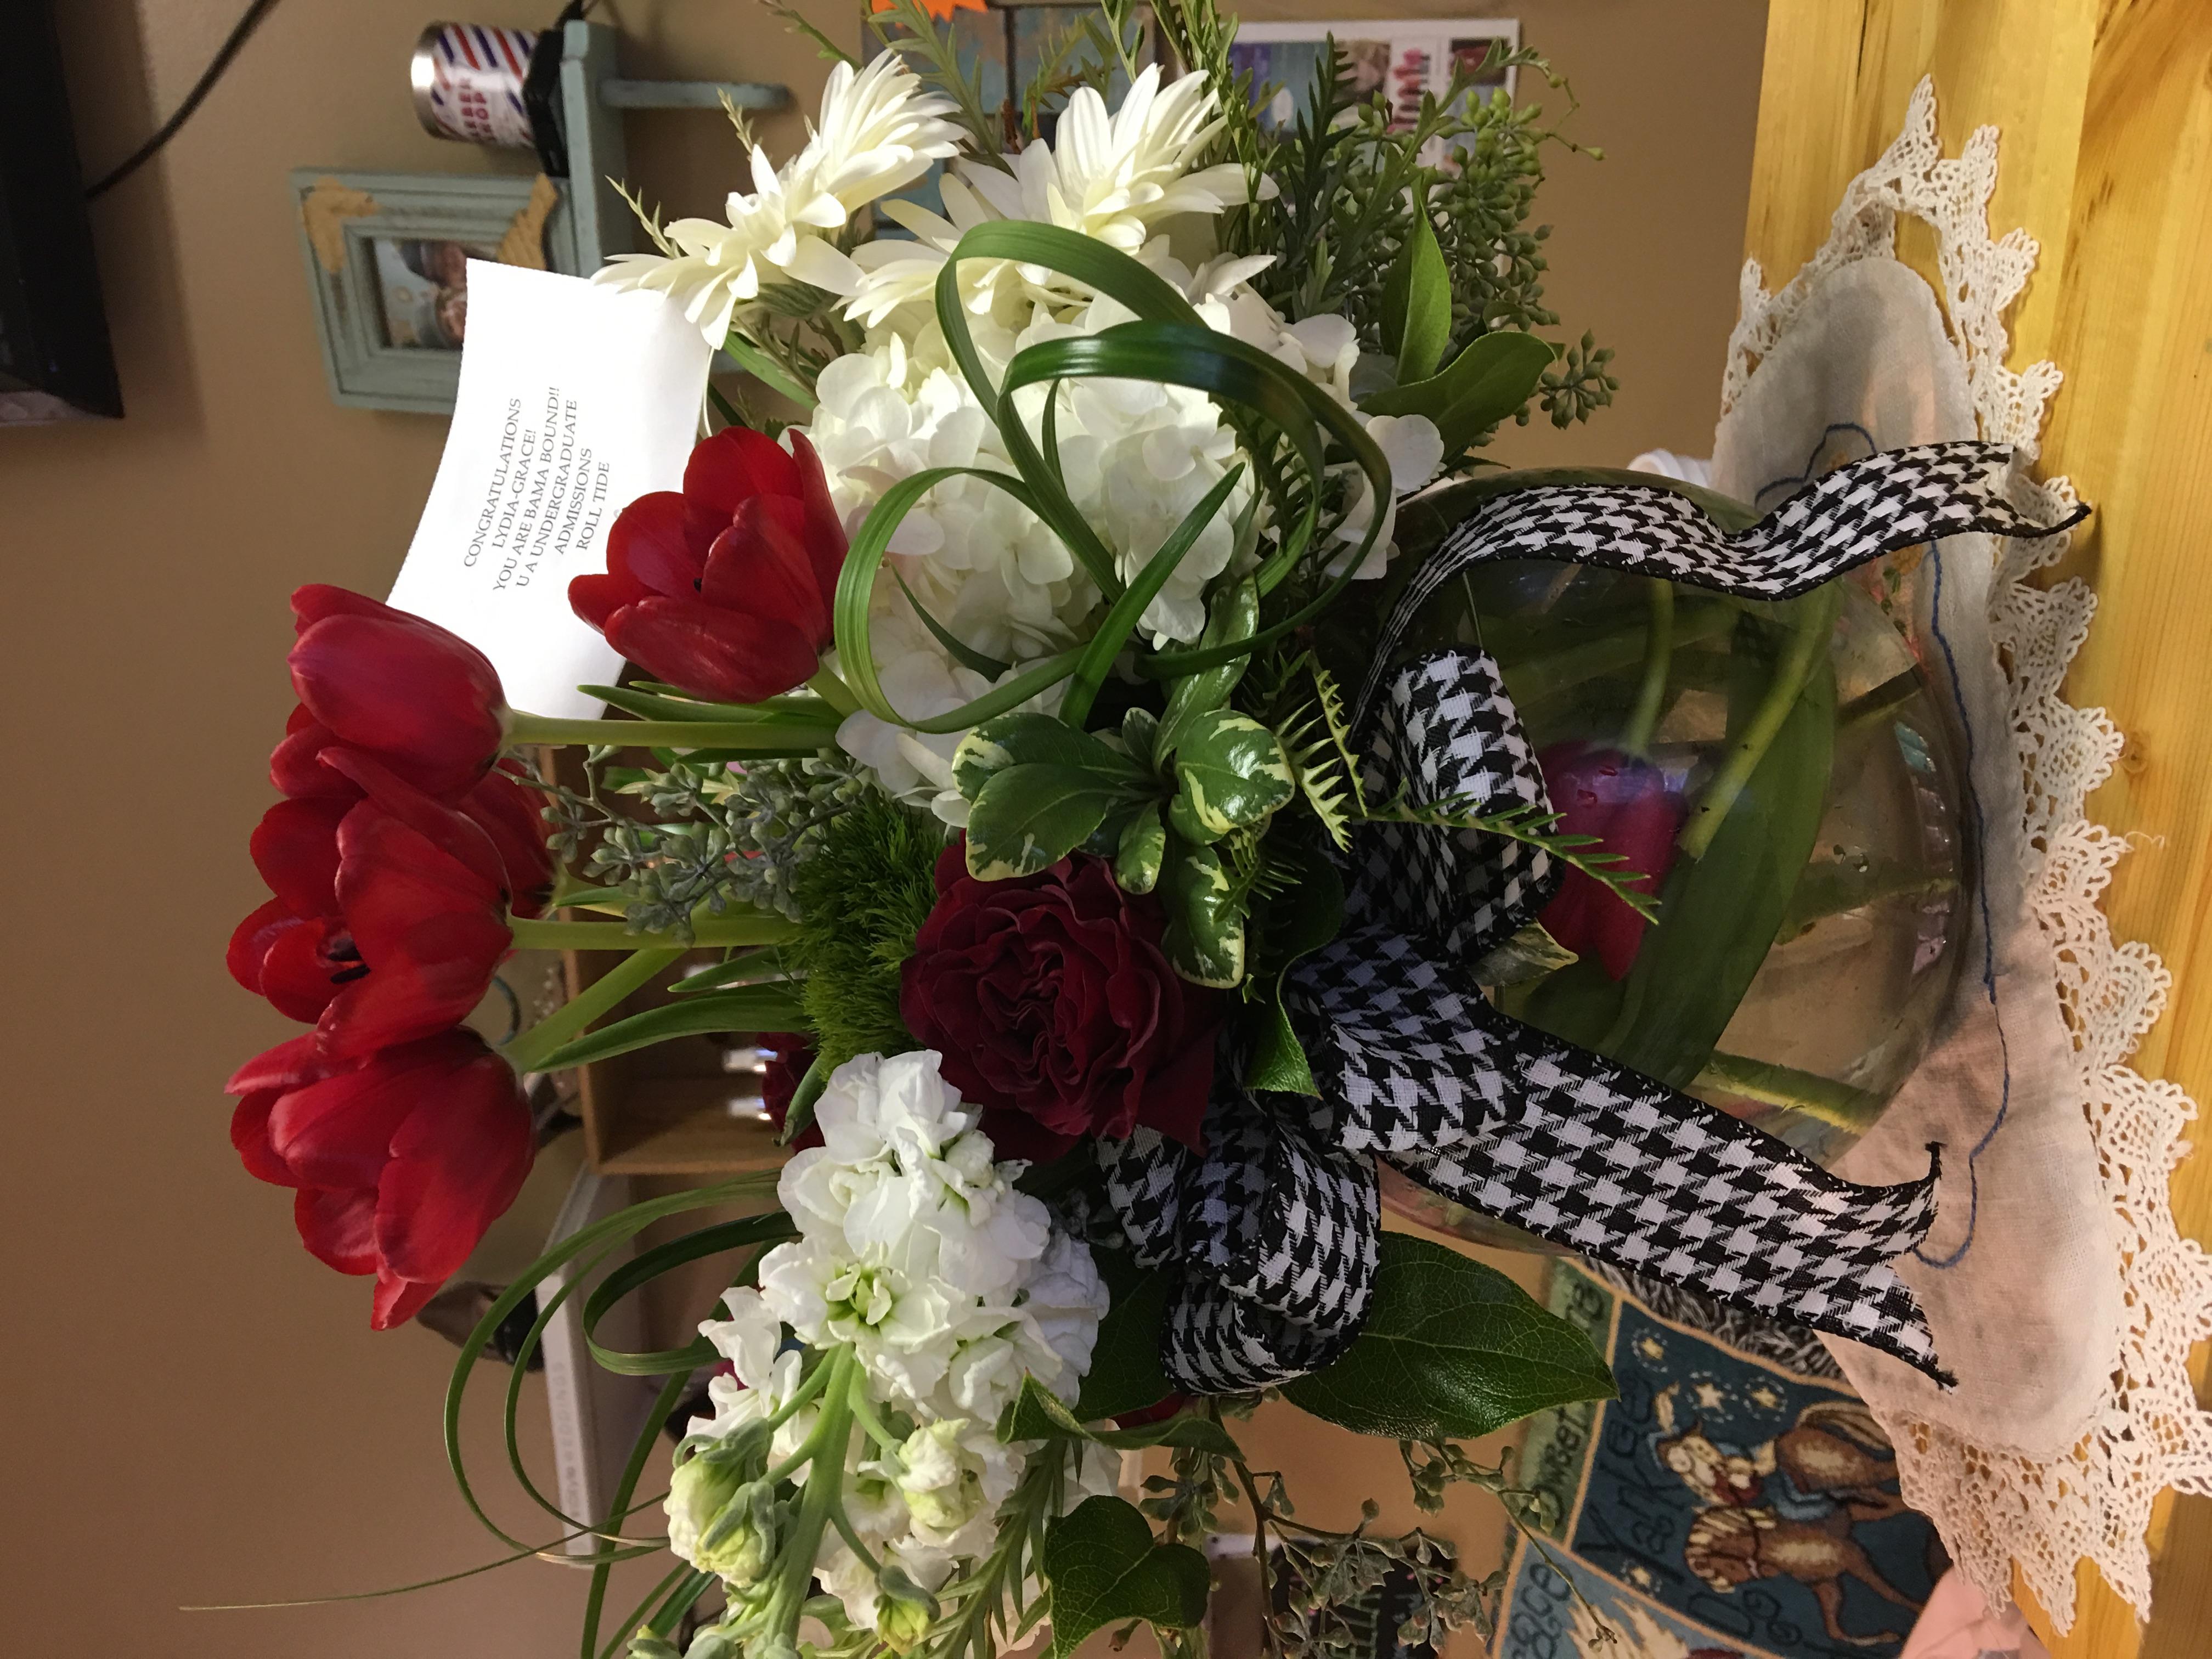 holiday flowers germantown tn 38138 yp com